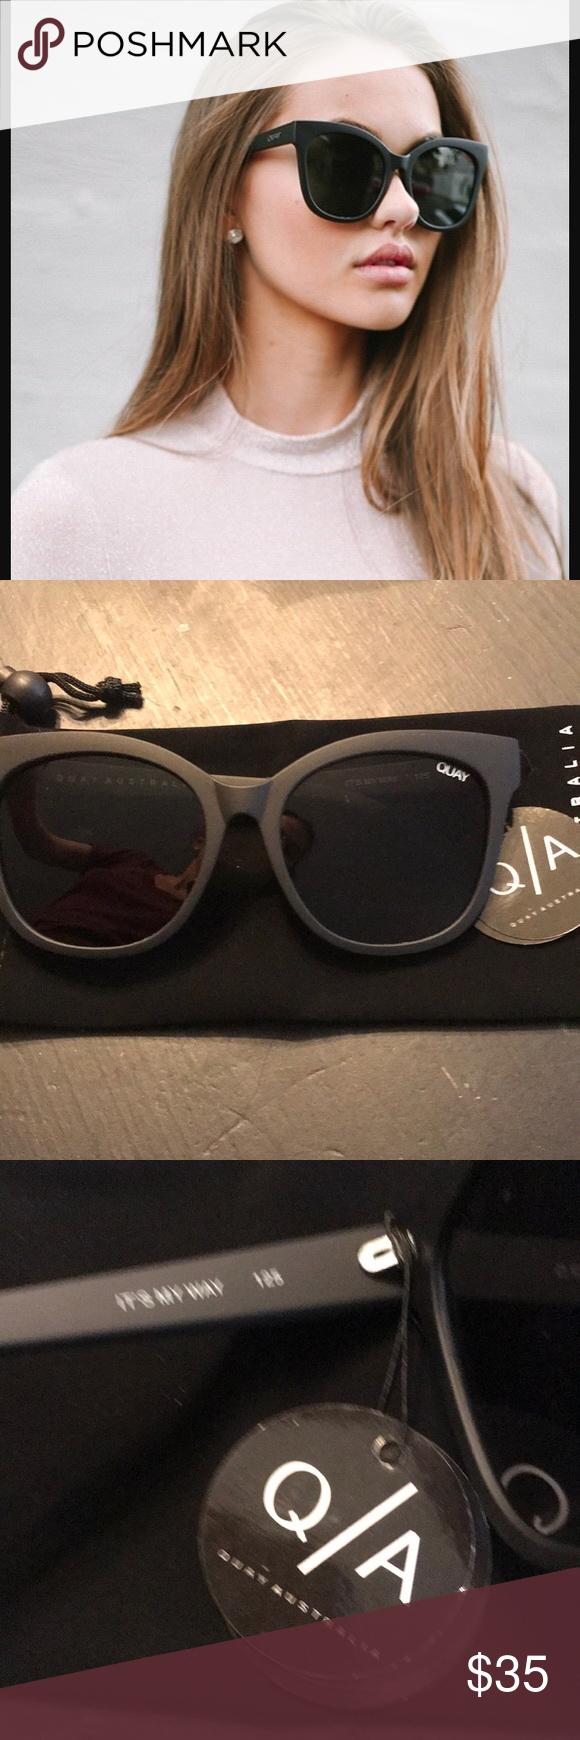 36a96de3cb0 NWT Quay It s My Way sunnies Brand new never worn. Comes with velvet Quay  drawstring case Quay Australia Accessories Sunglasses